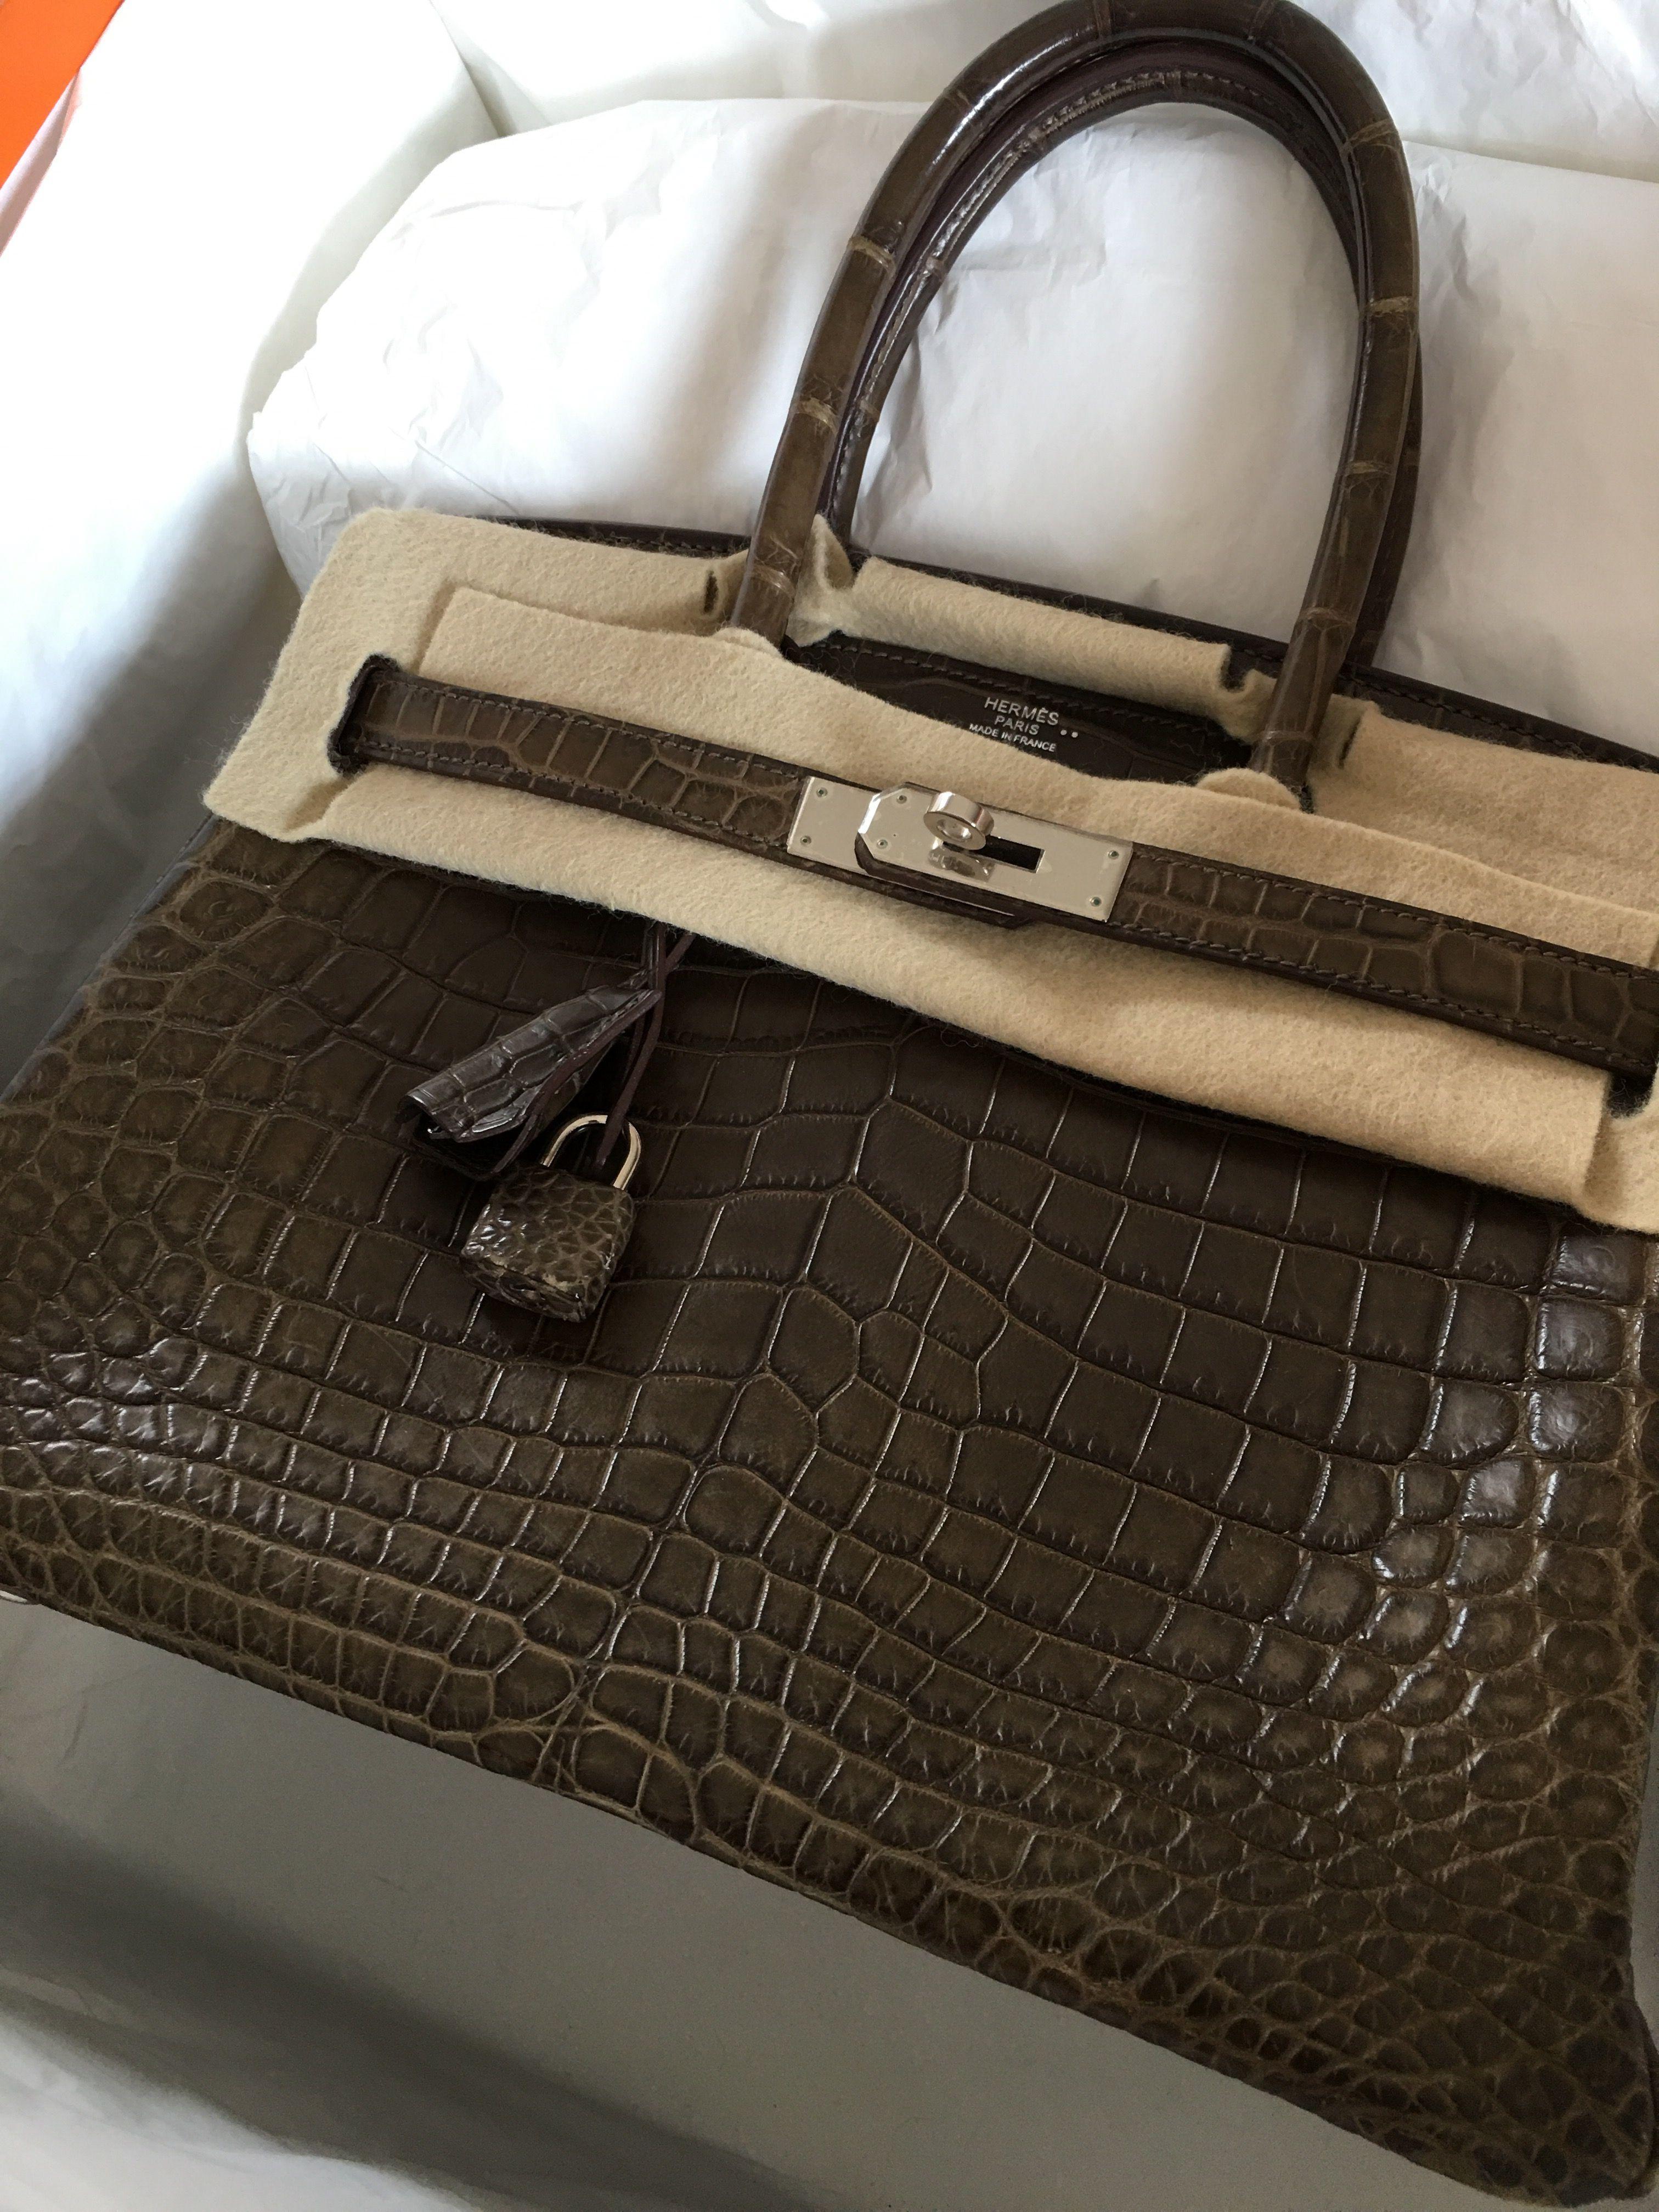 Model: Hermes Birkin 30 Crocodile Year: Q Color: Gris Elephant Leather:  Niloticus